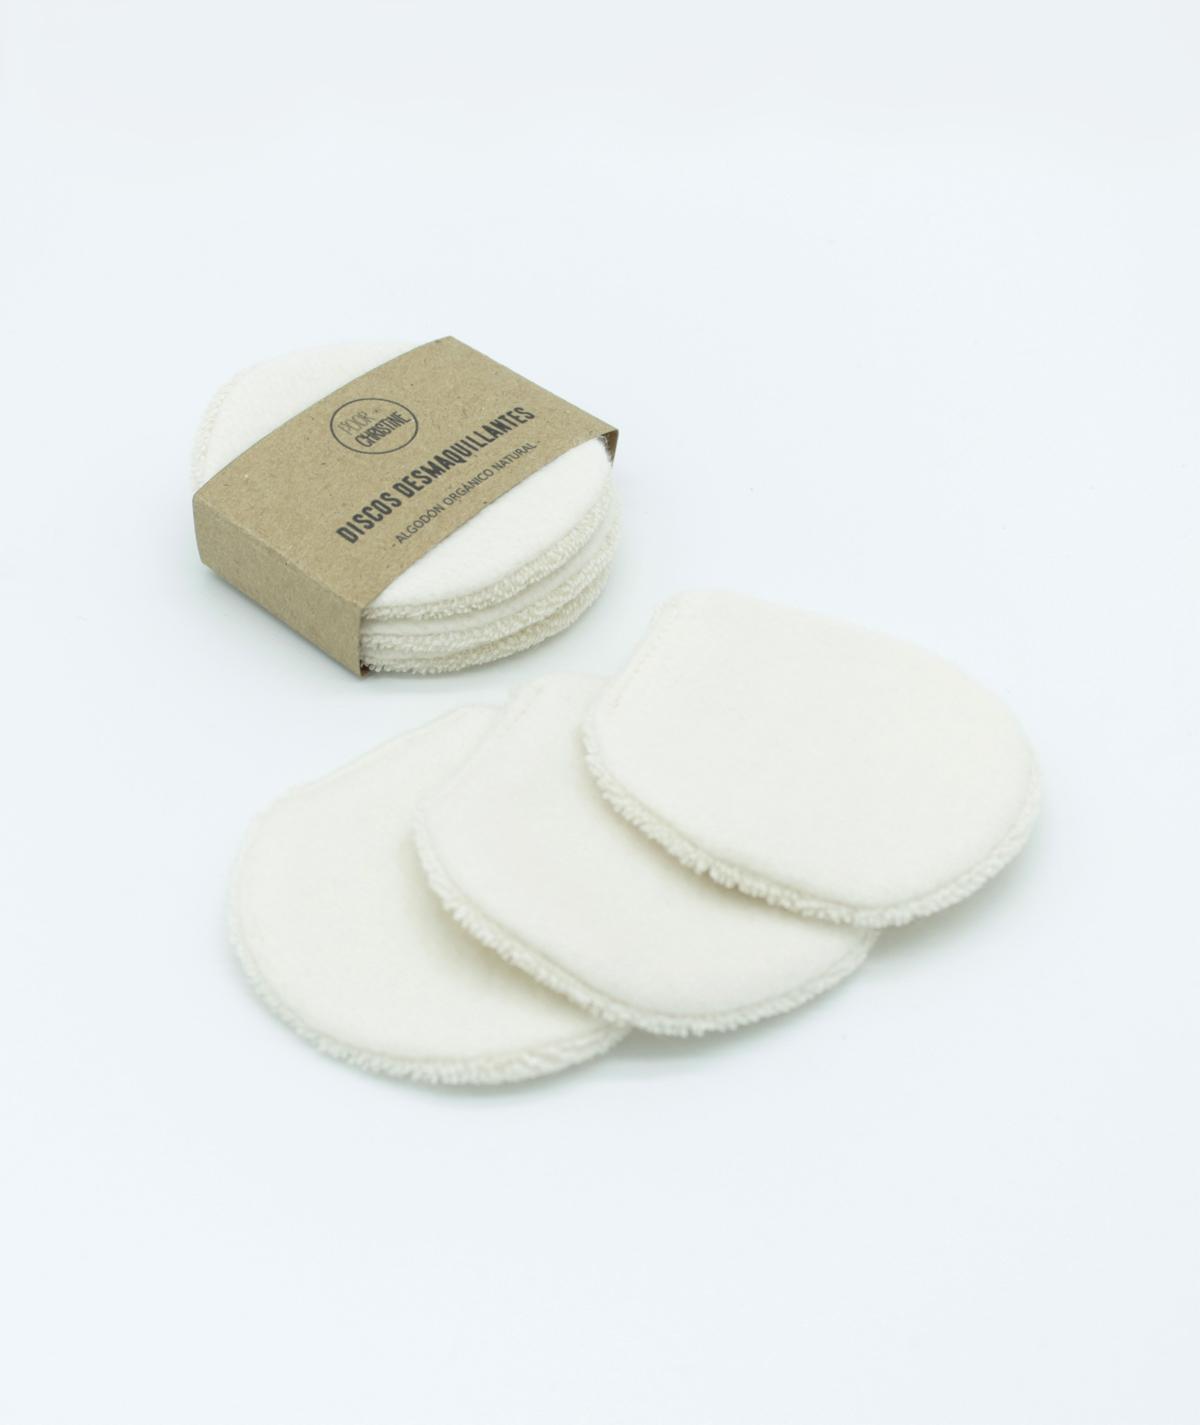 Pack 3 Discos Desmaquillantes Pequeños Reutilizables